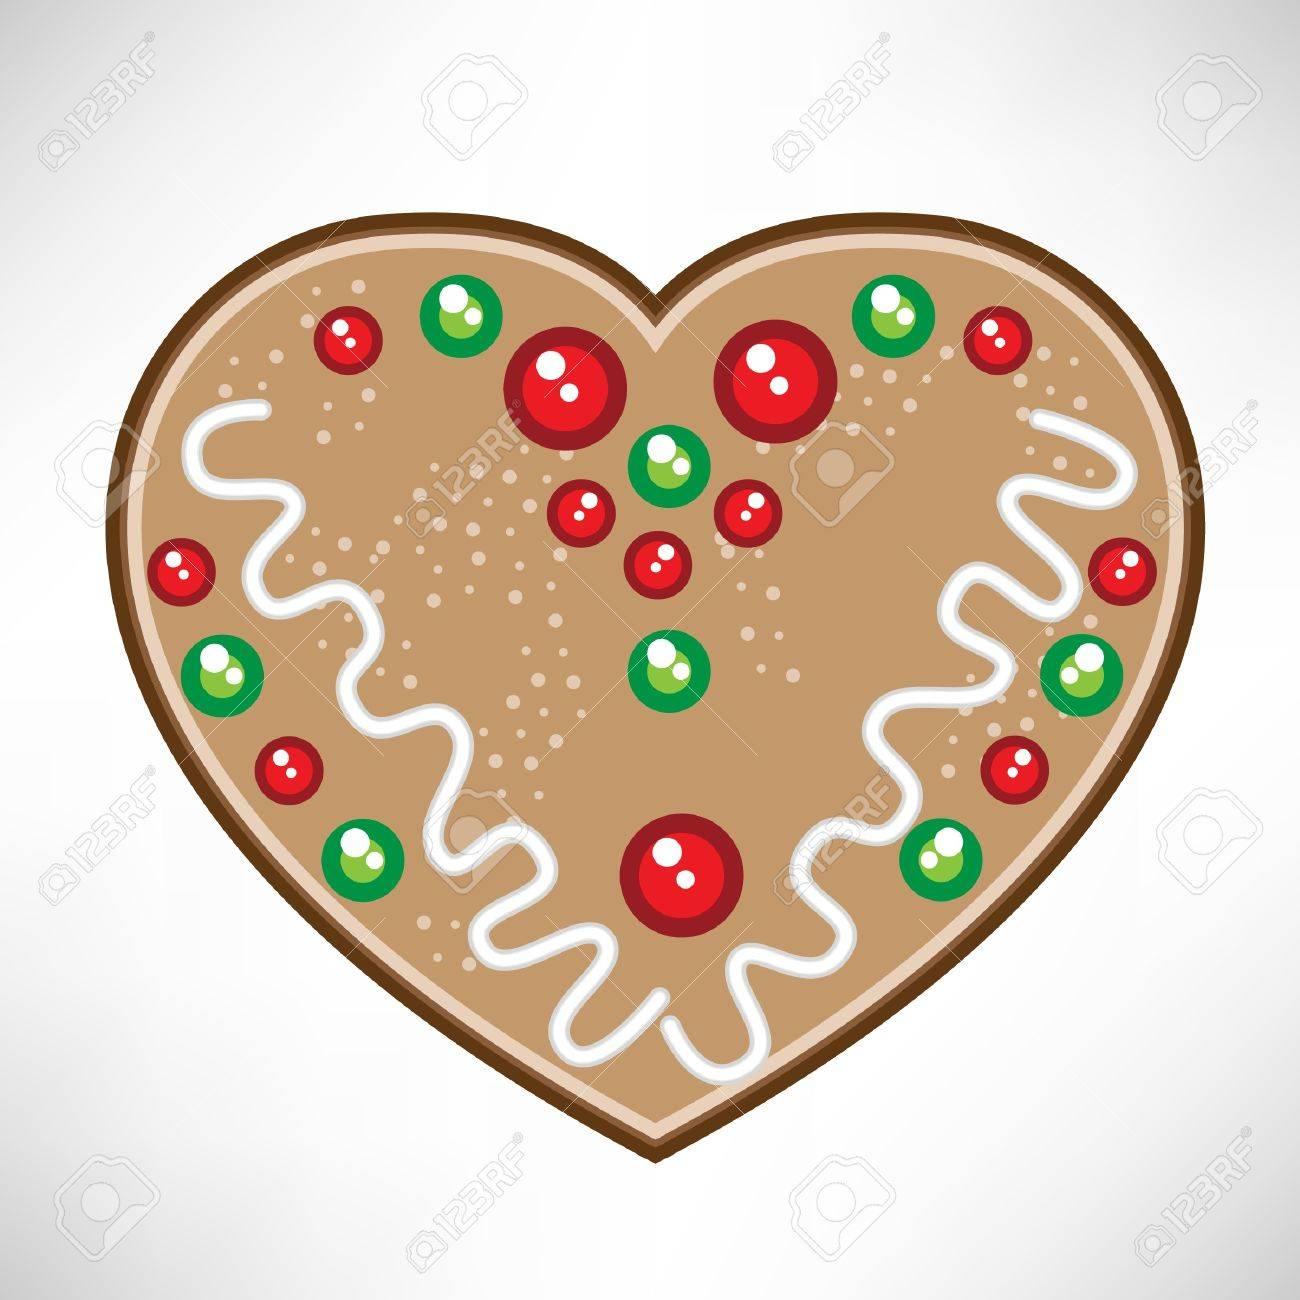 Christmas Heart Vector.Christmas Heart Cookie